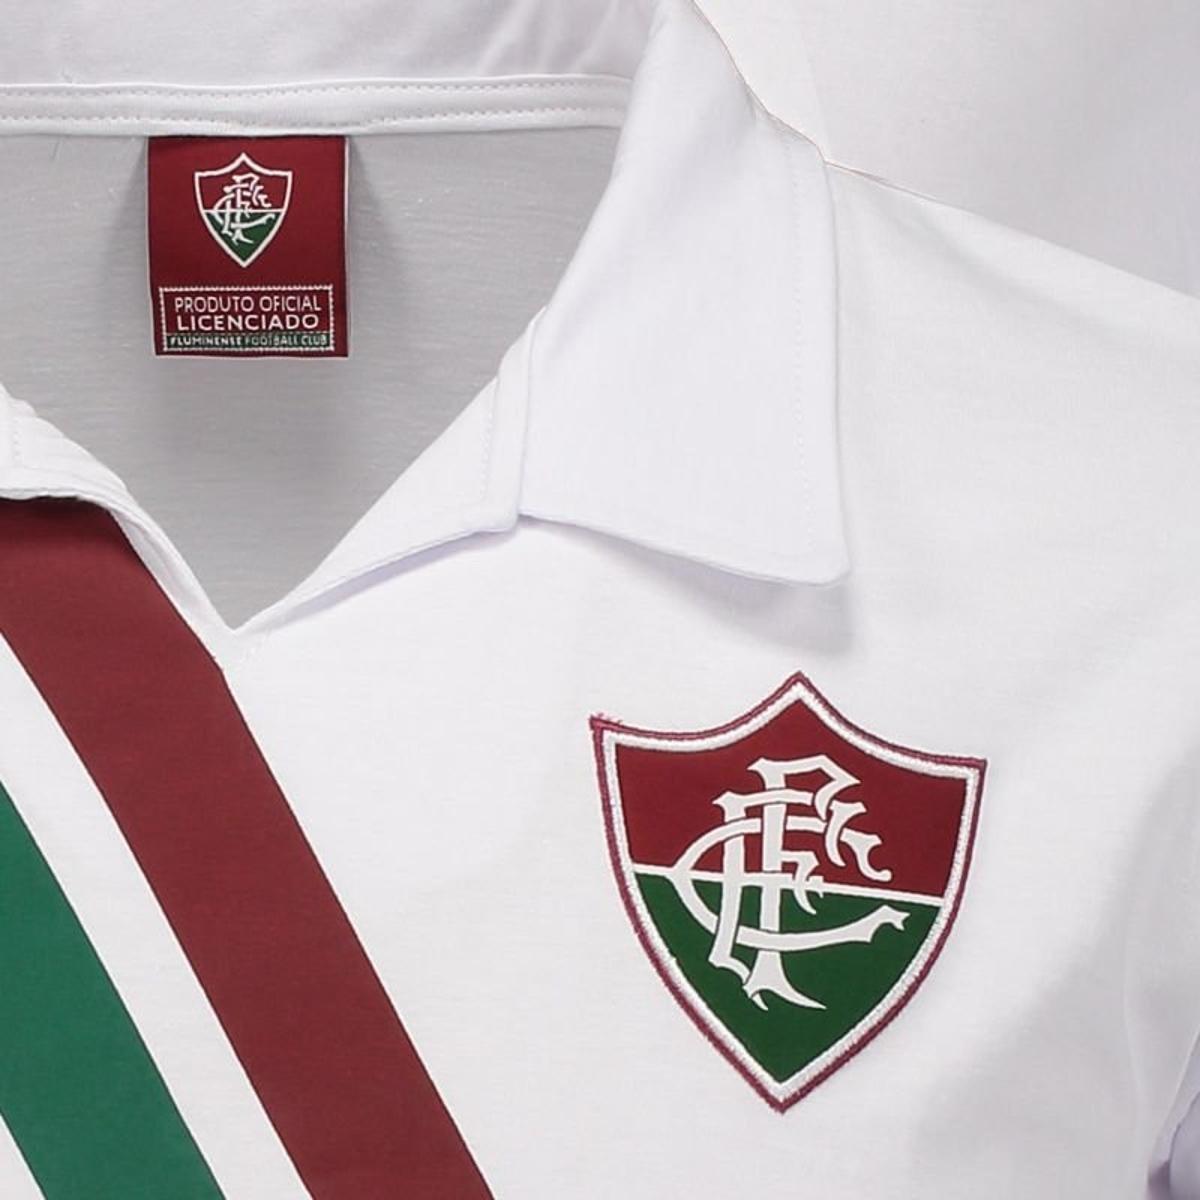 Camisa Fluminense Retrô Masculina - Branco - Compre Agora  dea06d5adca51